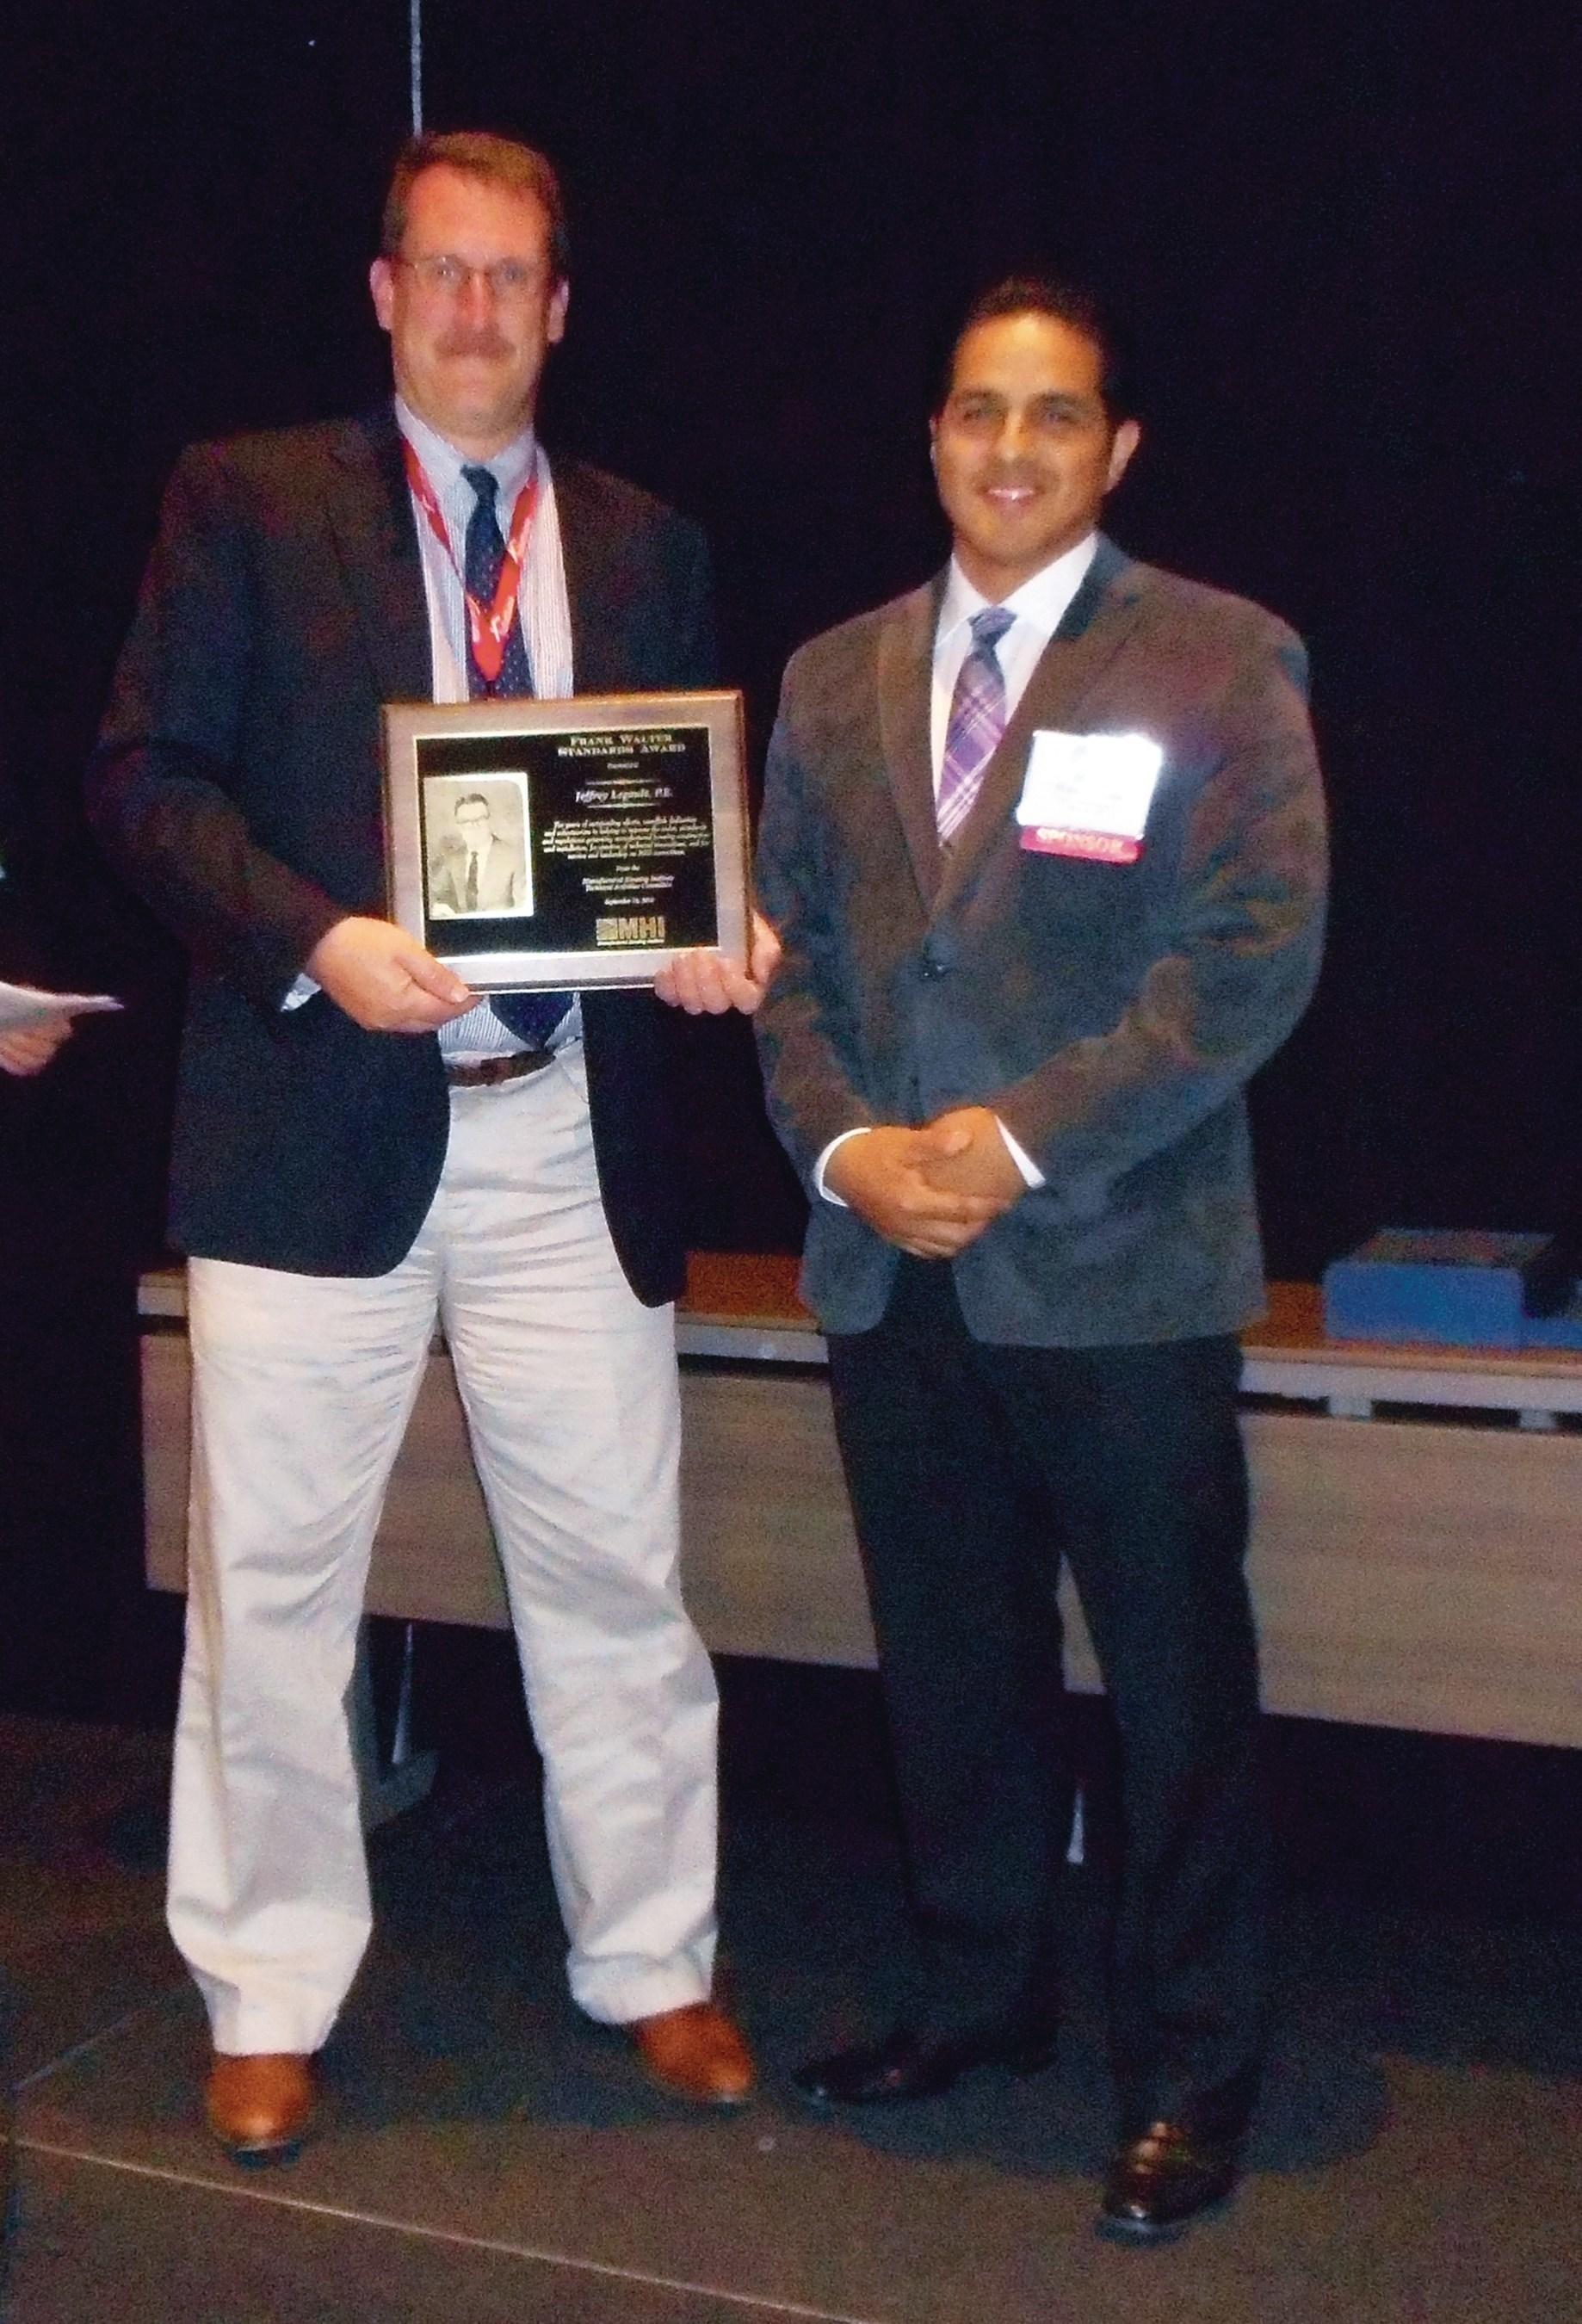 Jeffrey Legault (left) of Skyline Corporation receives the 2016 Frank Walter Standards Award from MHI.